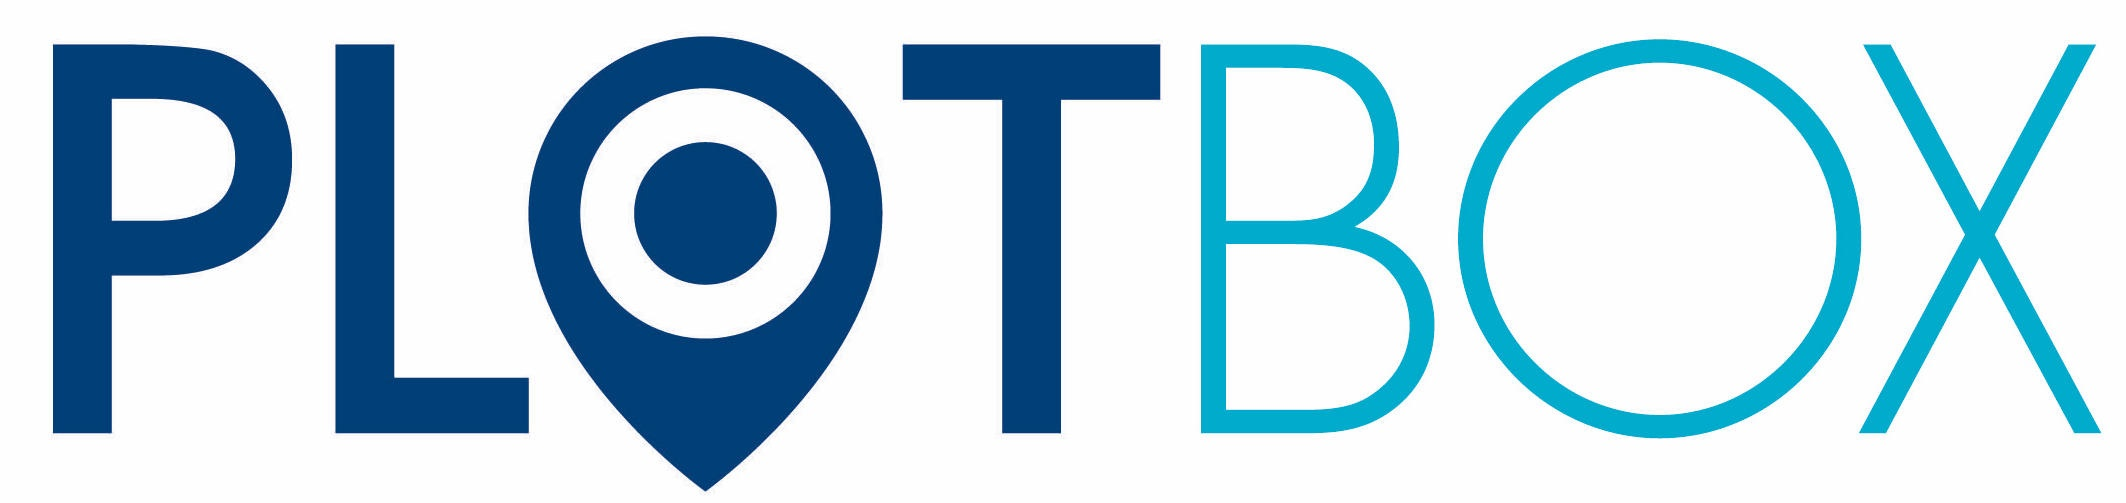 PlotBox New Logo 2018